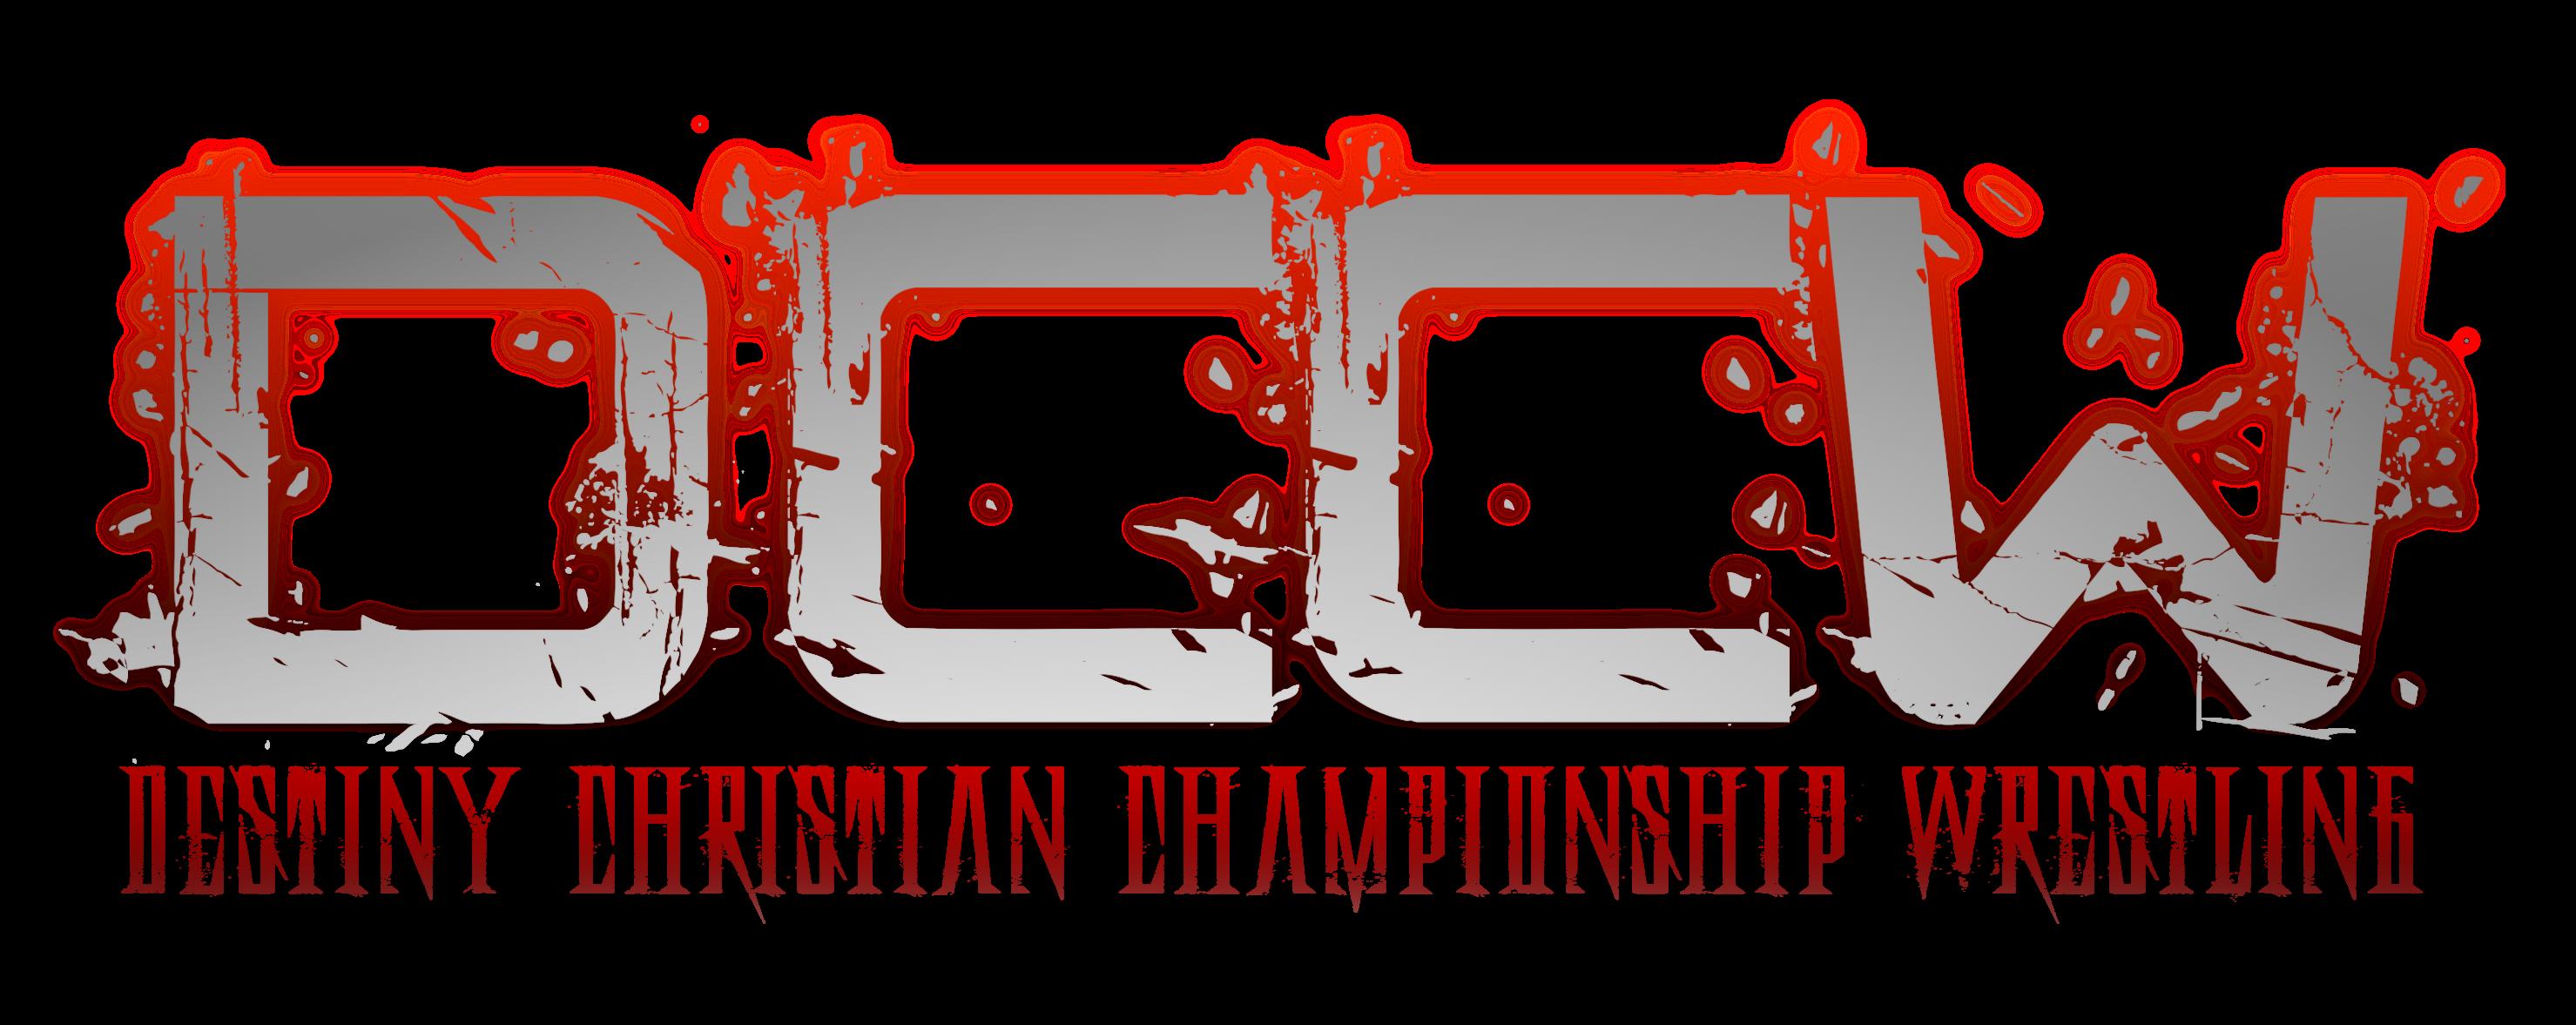 Destiny Christian Championship Wrestling